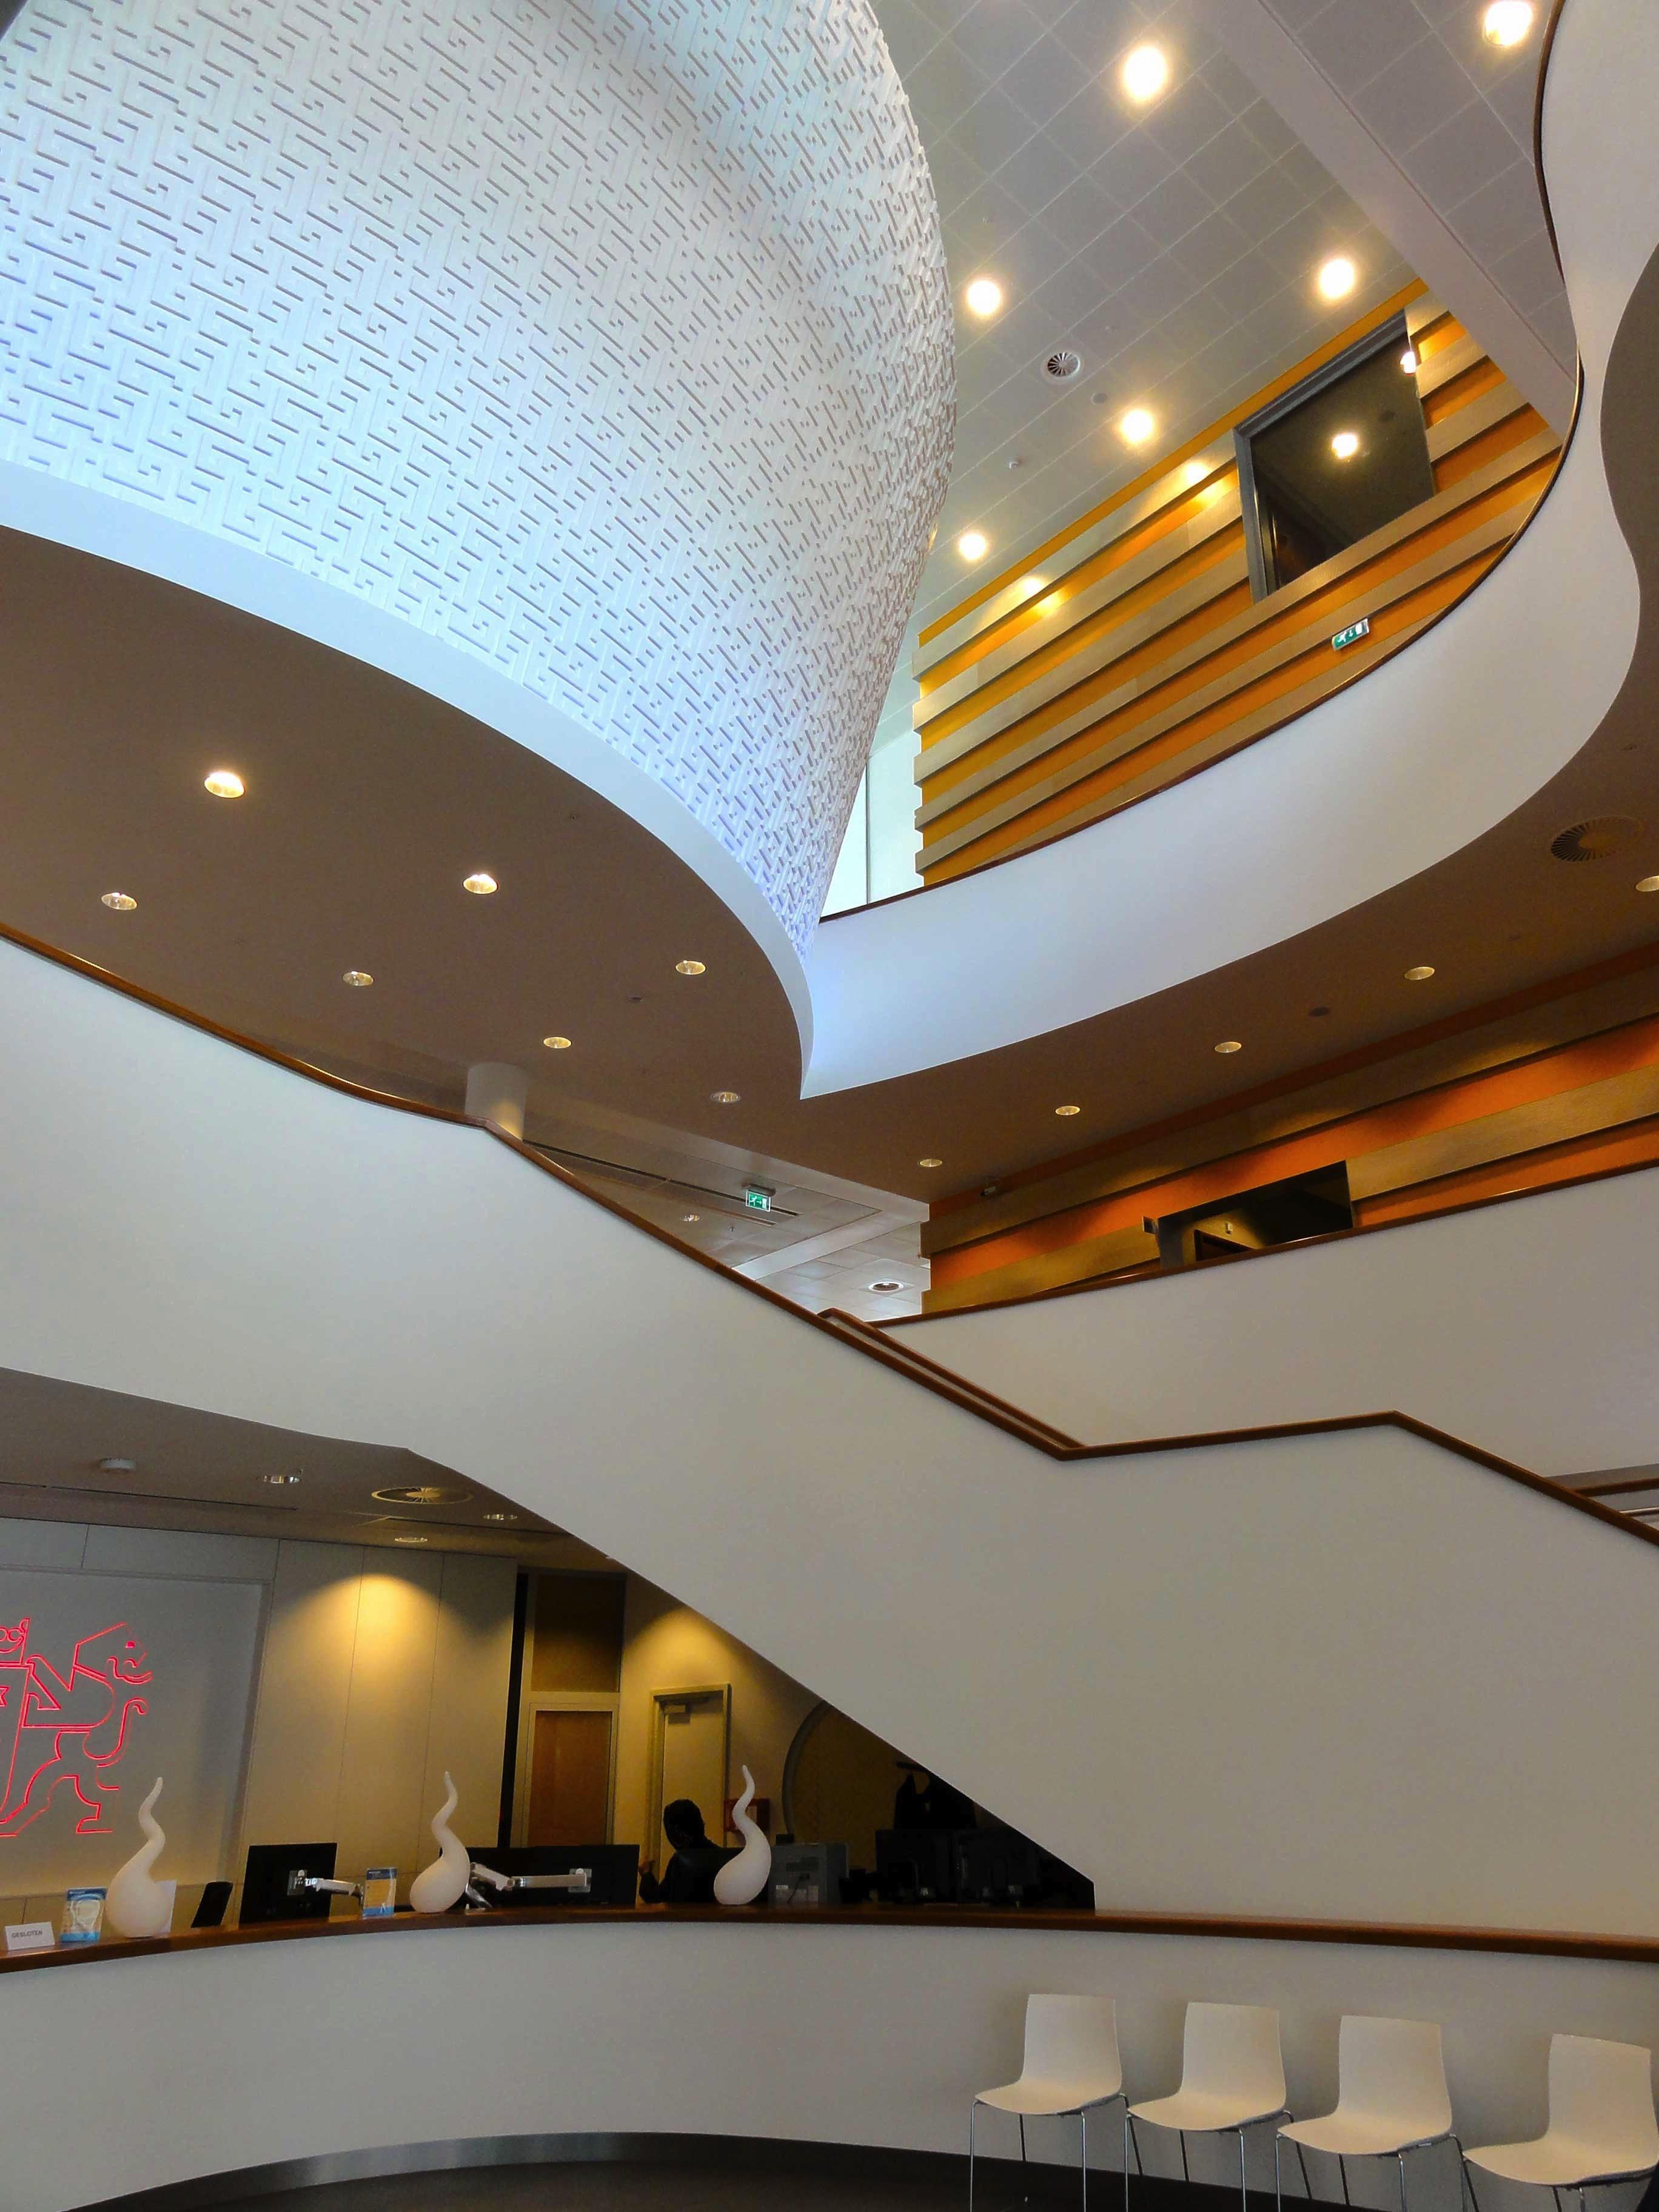 Fotos gratis arquitectura sala interior edificio for Diseno de iluminacion de interiores